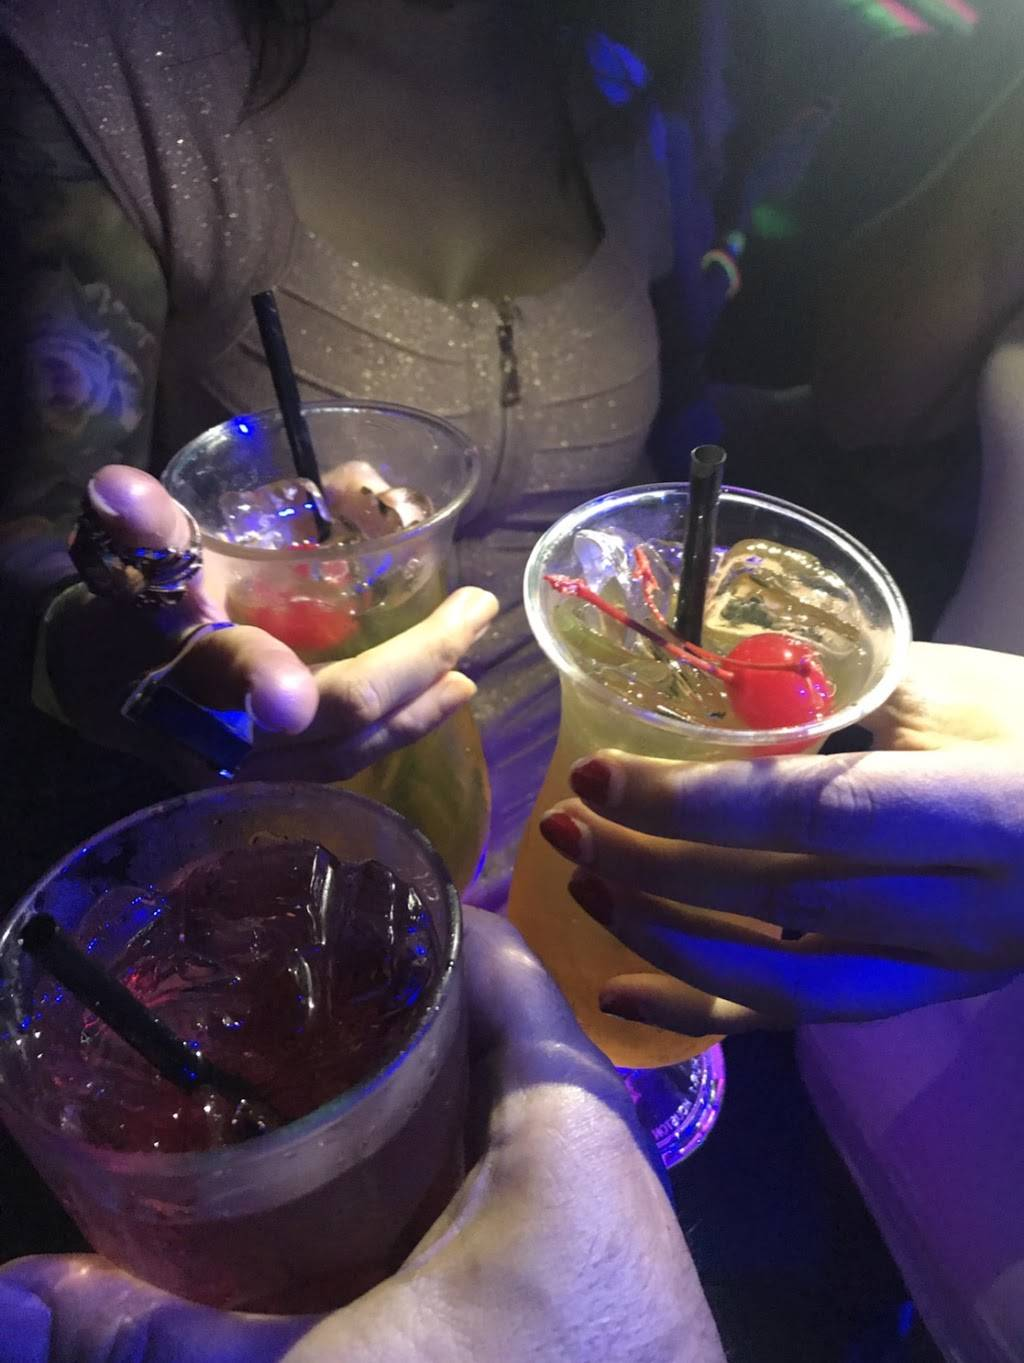 Mezcal Lounge | night club | 1310 Van Ness Ave, Fresno, CA 93721, USA | 5595130700 OR +1 559-513-0700